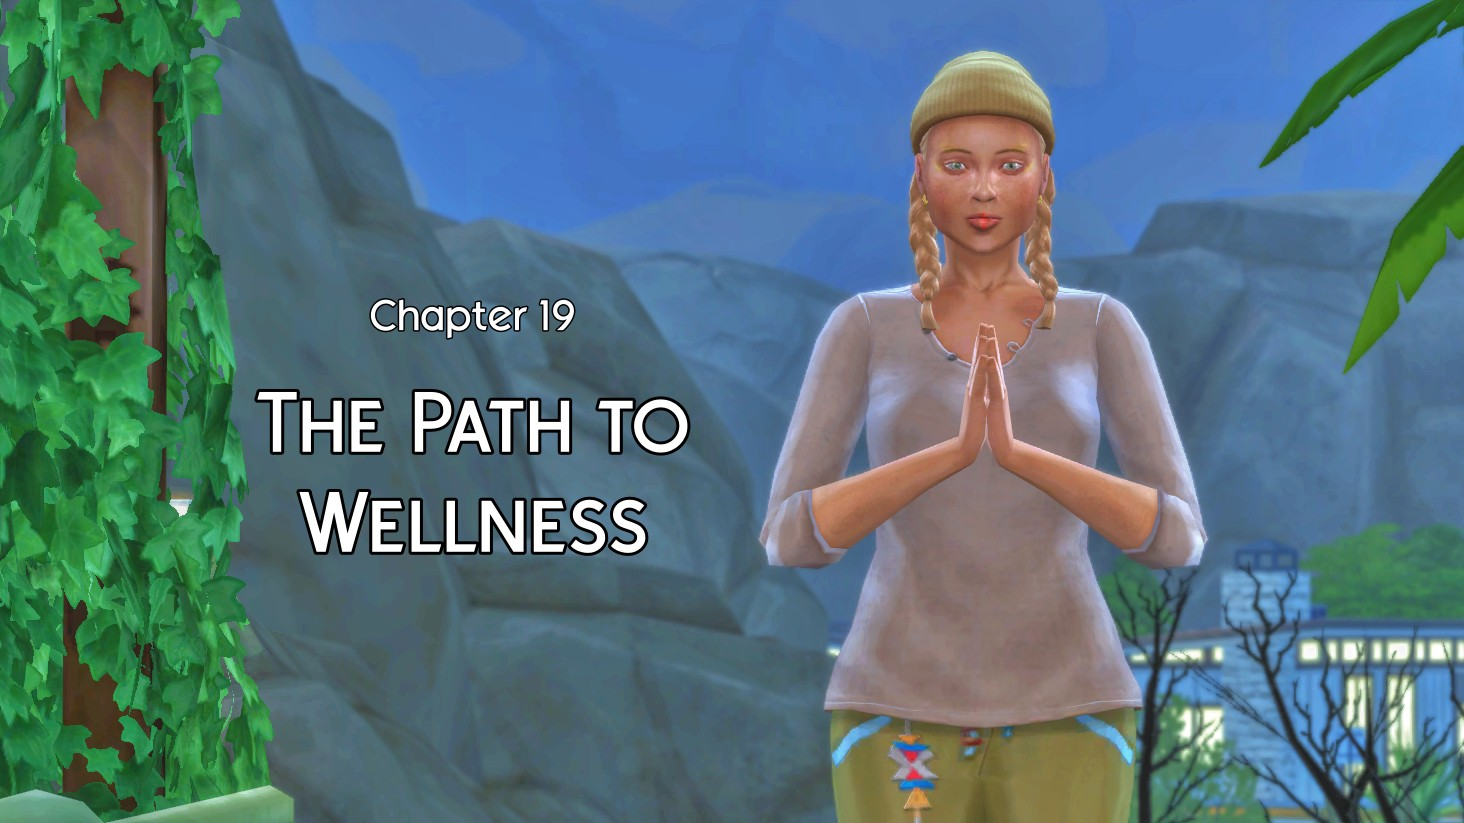 wellness title 2020